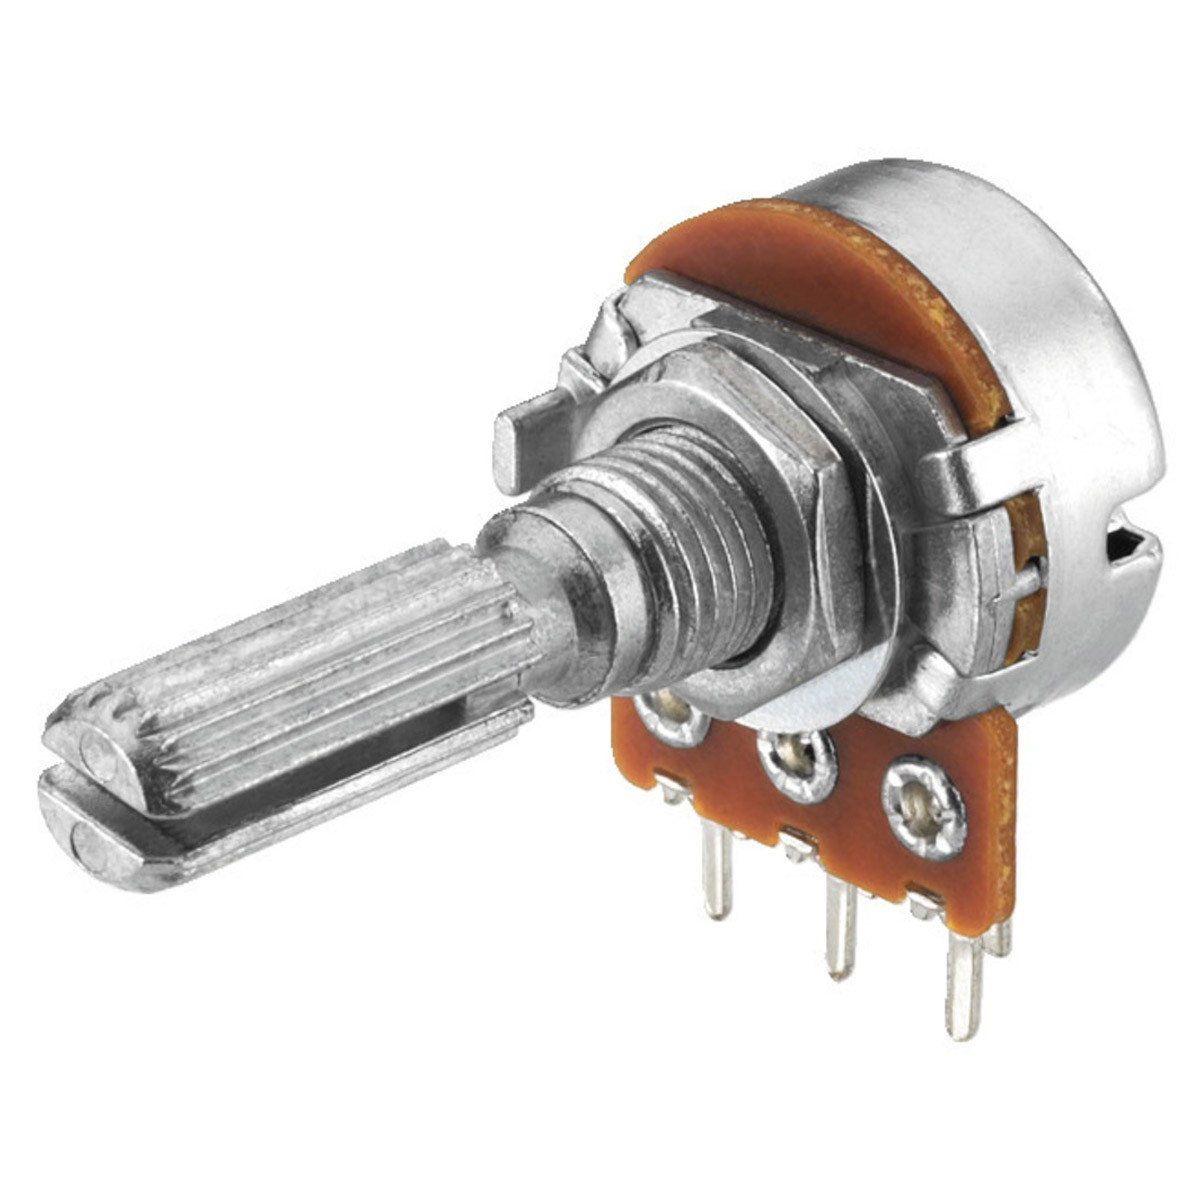 Mono potentiometer VRB-100M1000 1mohm